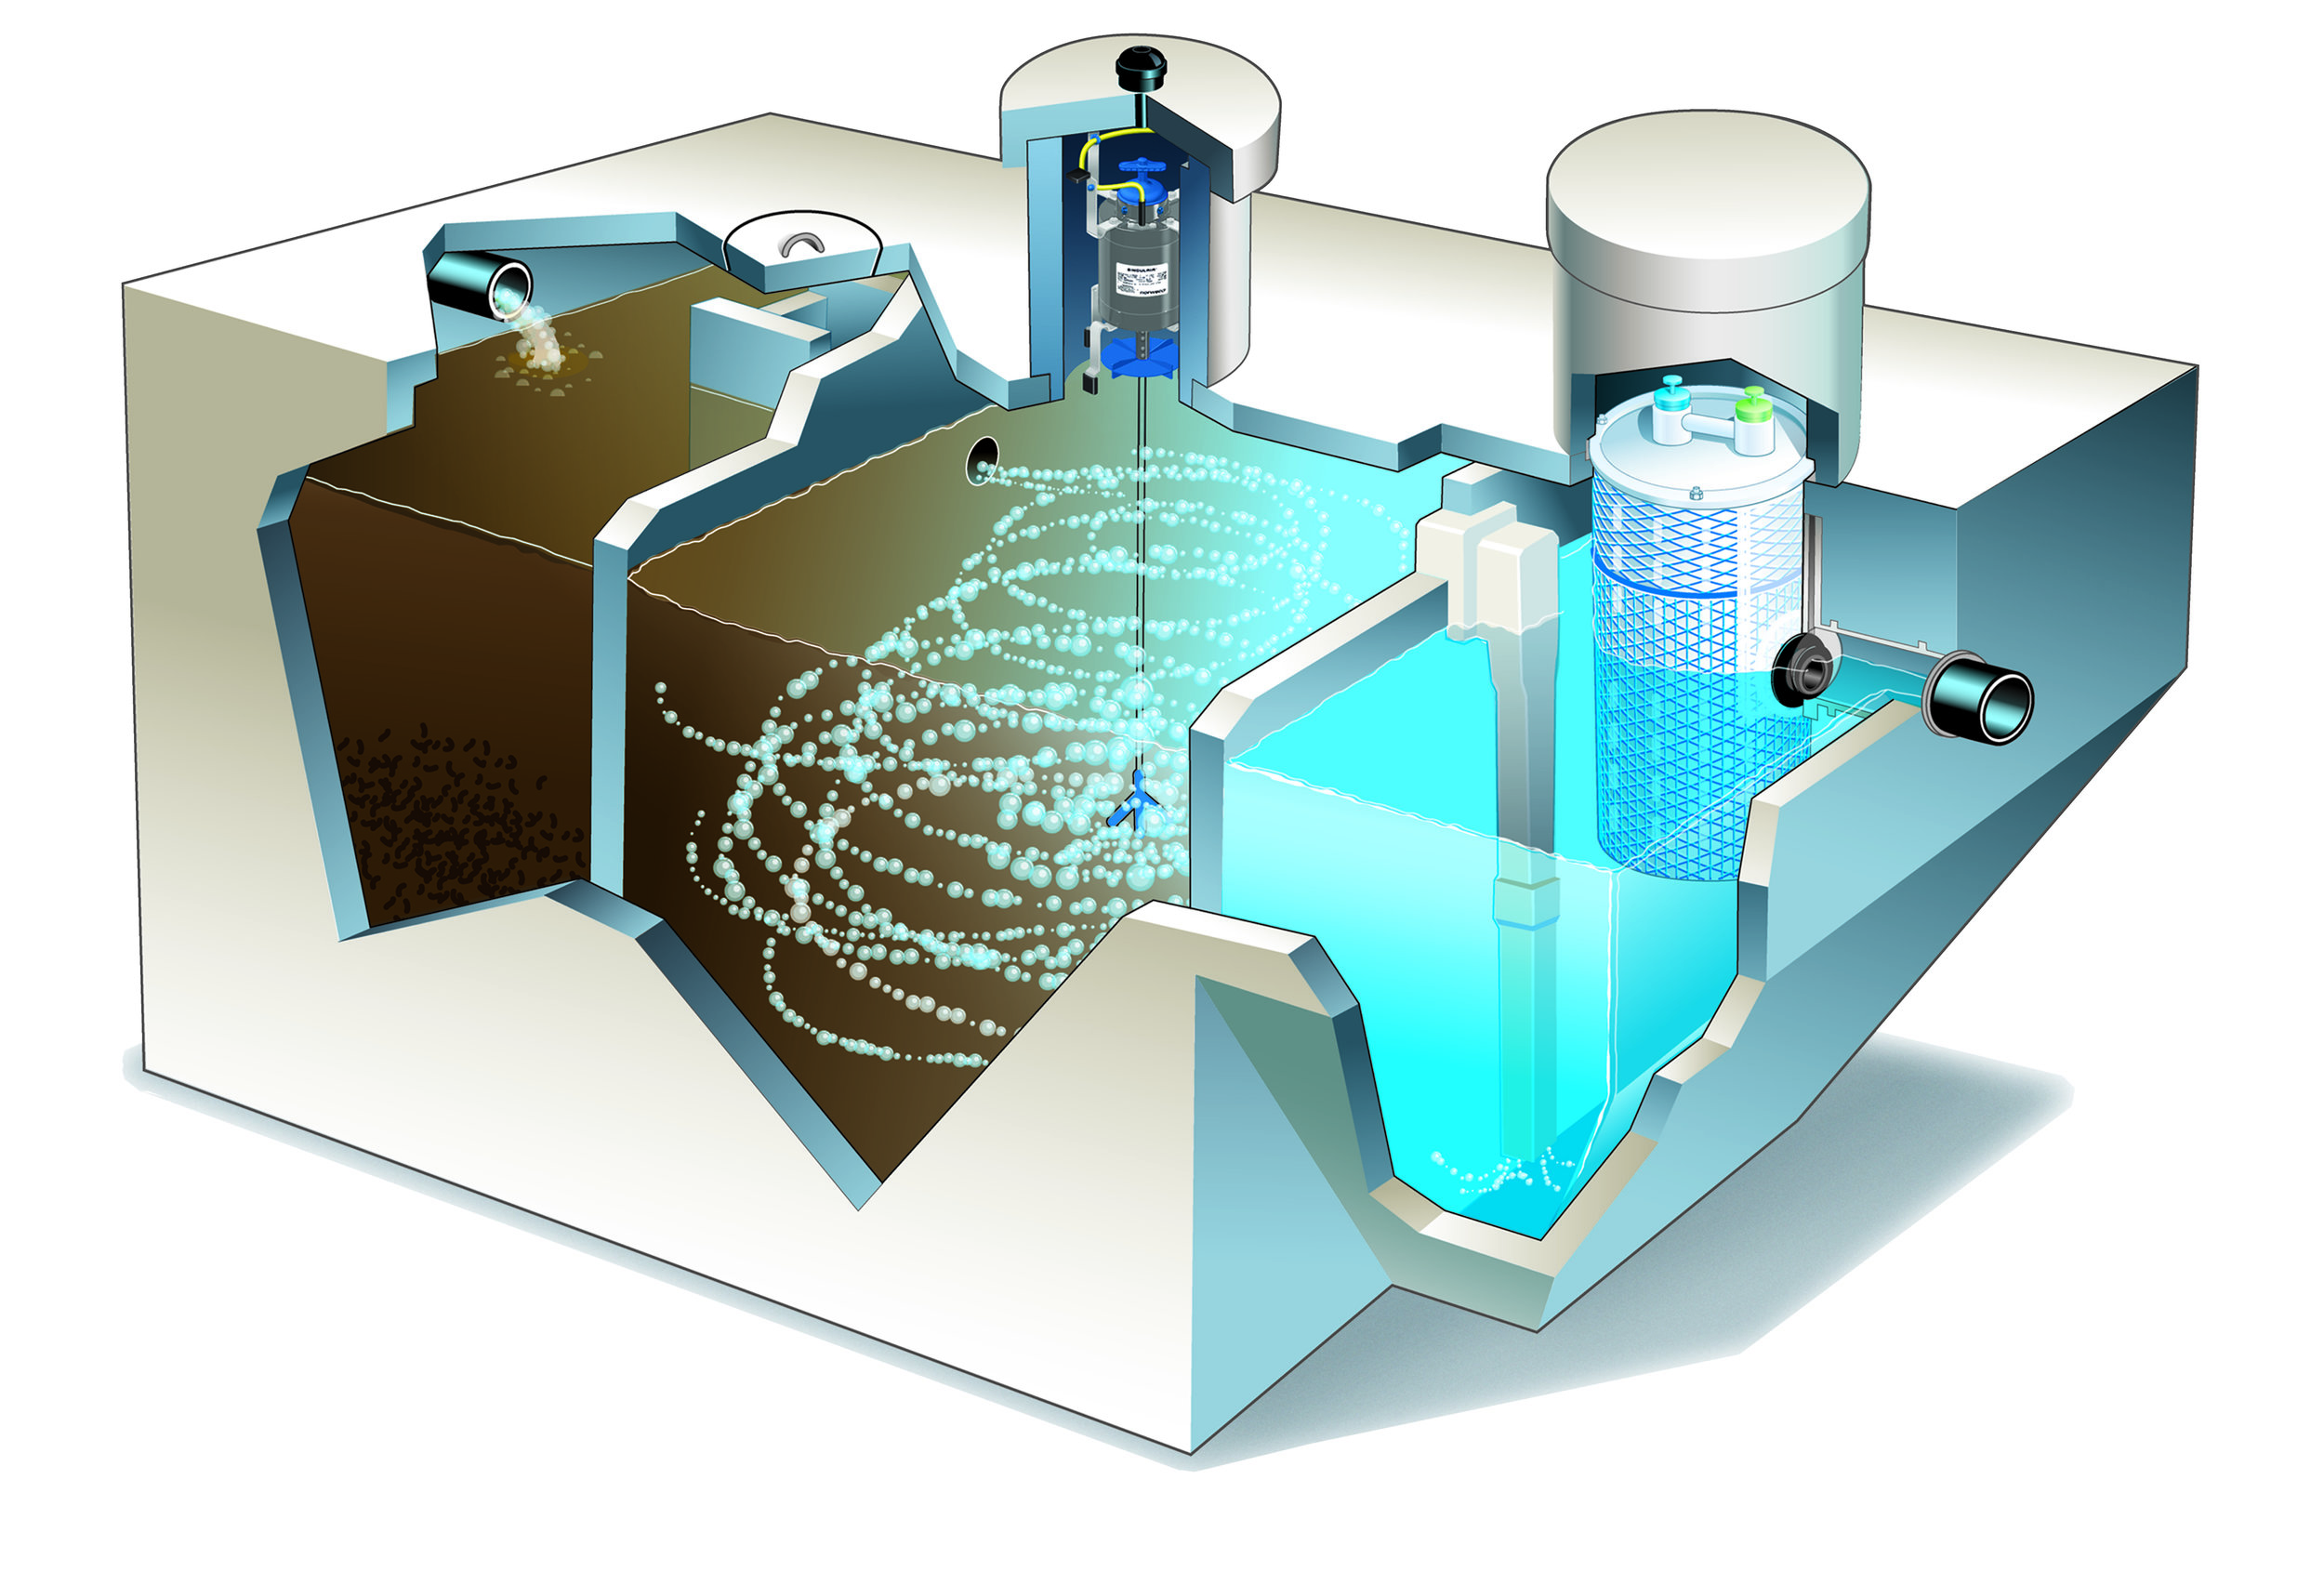 Singulair System image.jpg